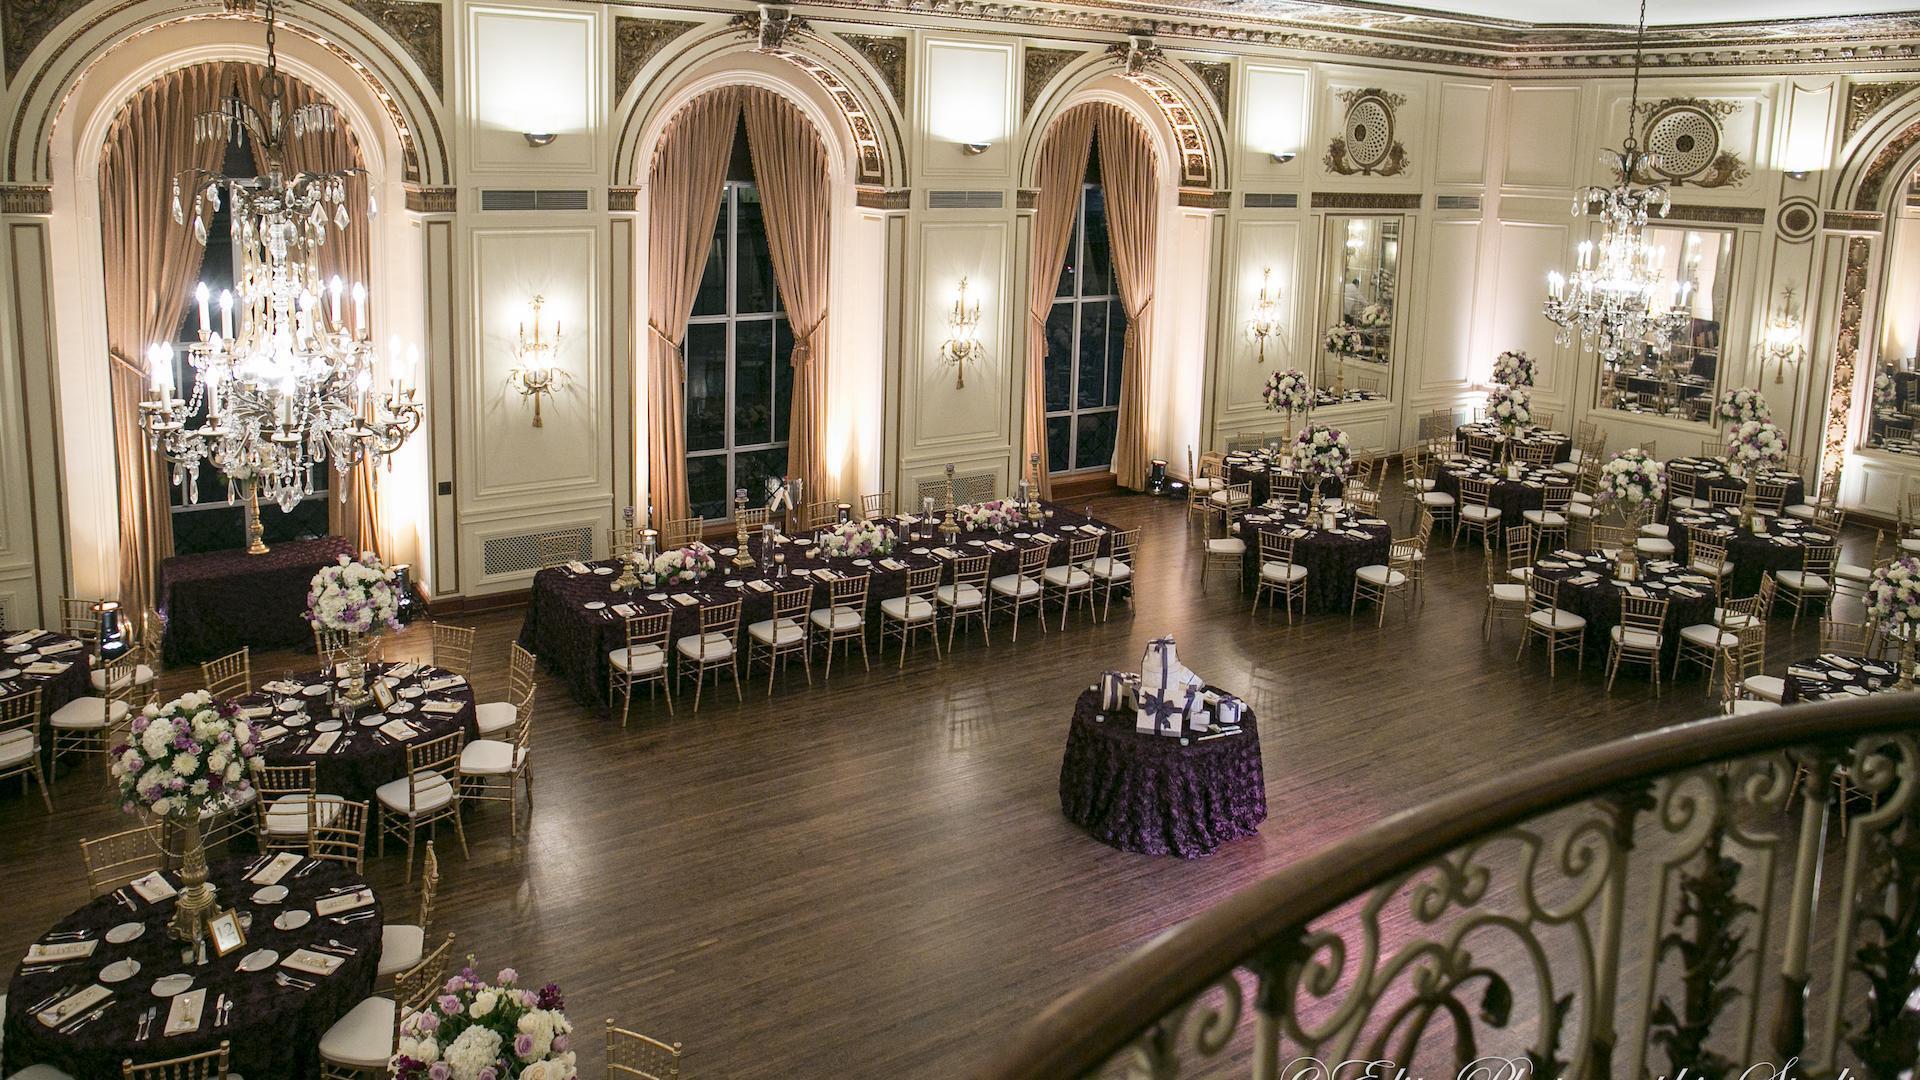 Rent Gem Theatre | Corporate Events | Wedding Locations, Event ...